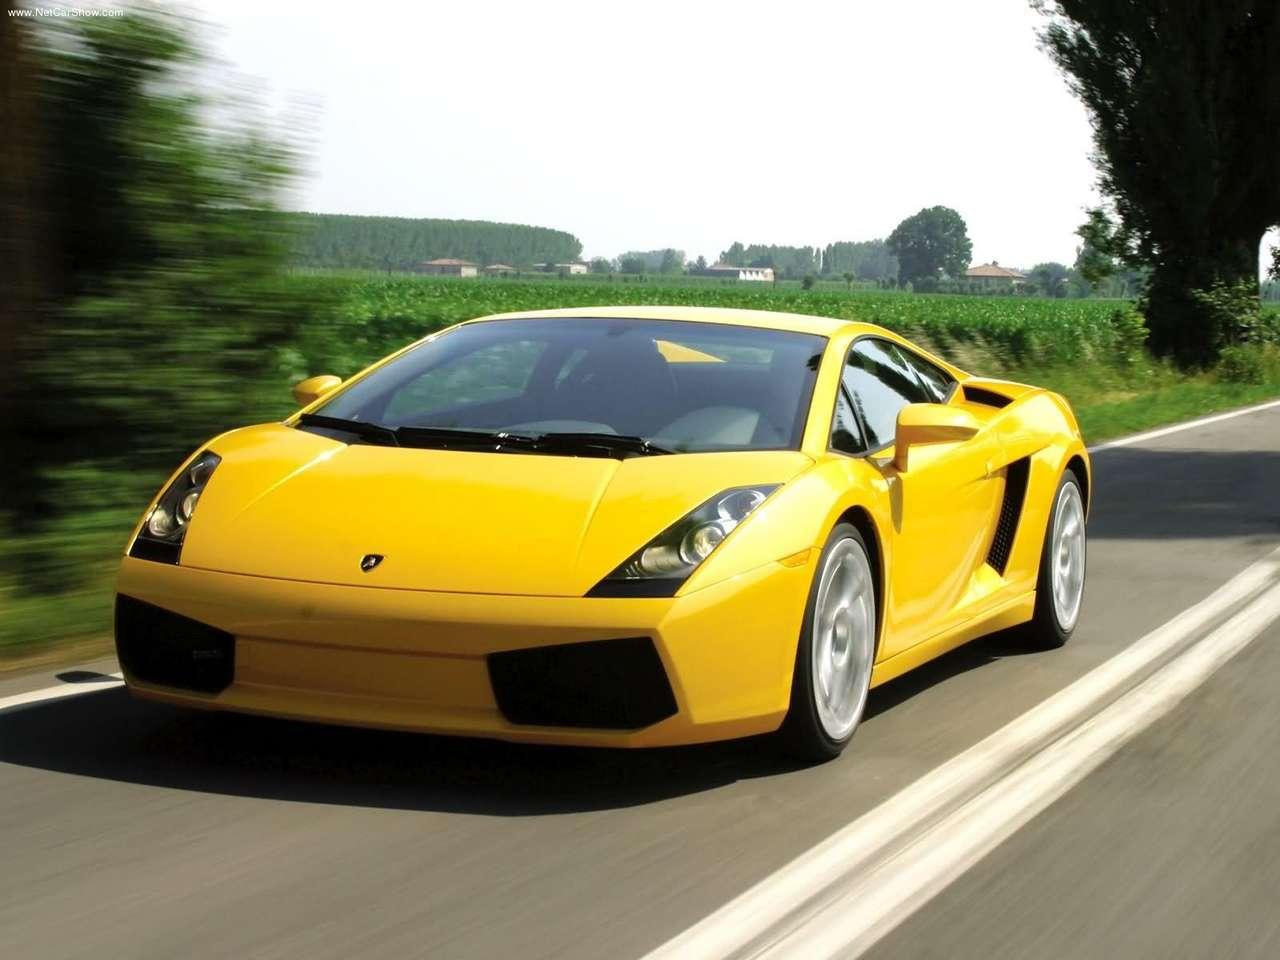 http://3.bp.blogspot.com/-42FoSAqrjlg/T_L8ErK_o6I/AAAAAAAACME/0k7ltnVwHis/s1600/Lamborghini-Gallardo_2003_1280x960_wallpaper_08.jpg